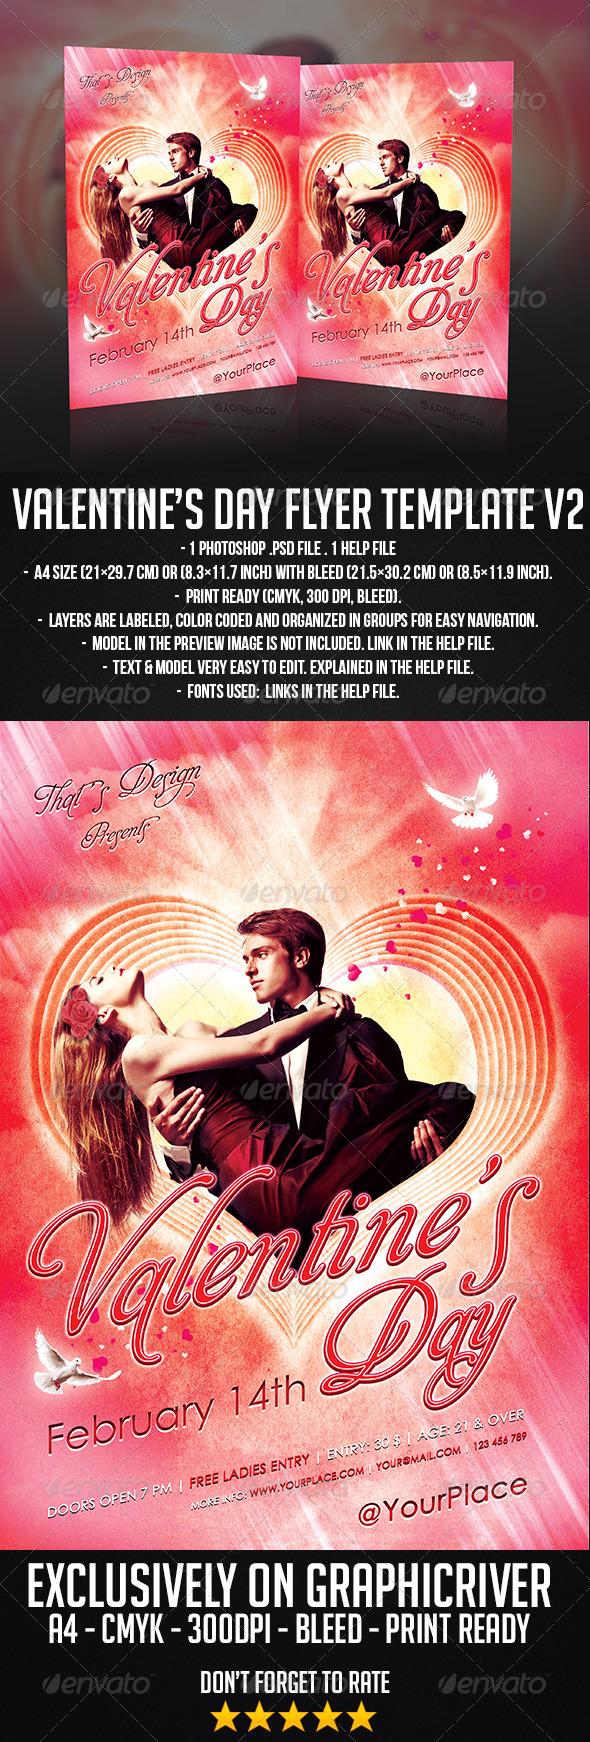 GraphicRiver Valentine s Day Flyer Template 6480260